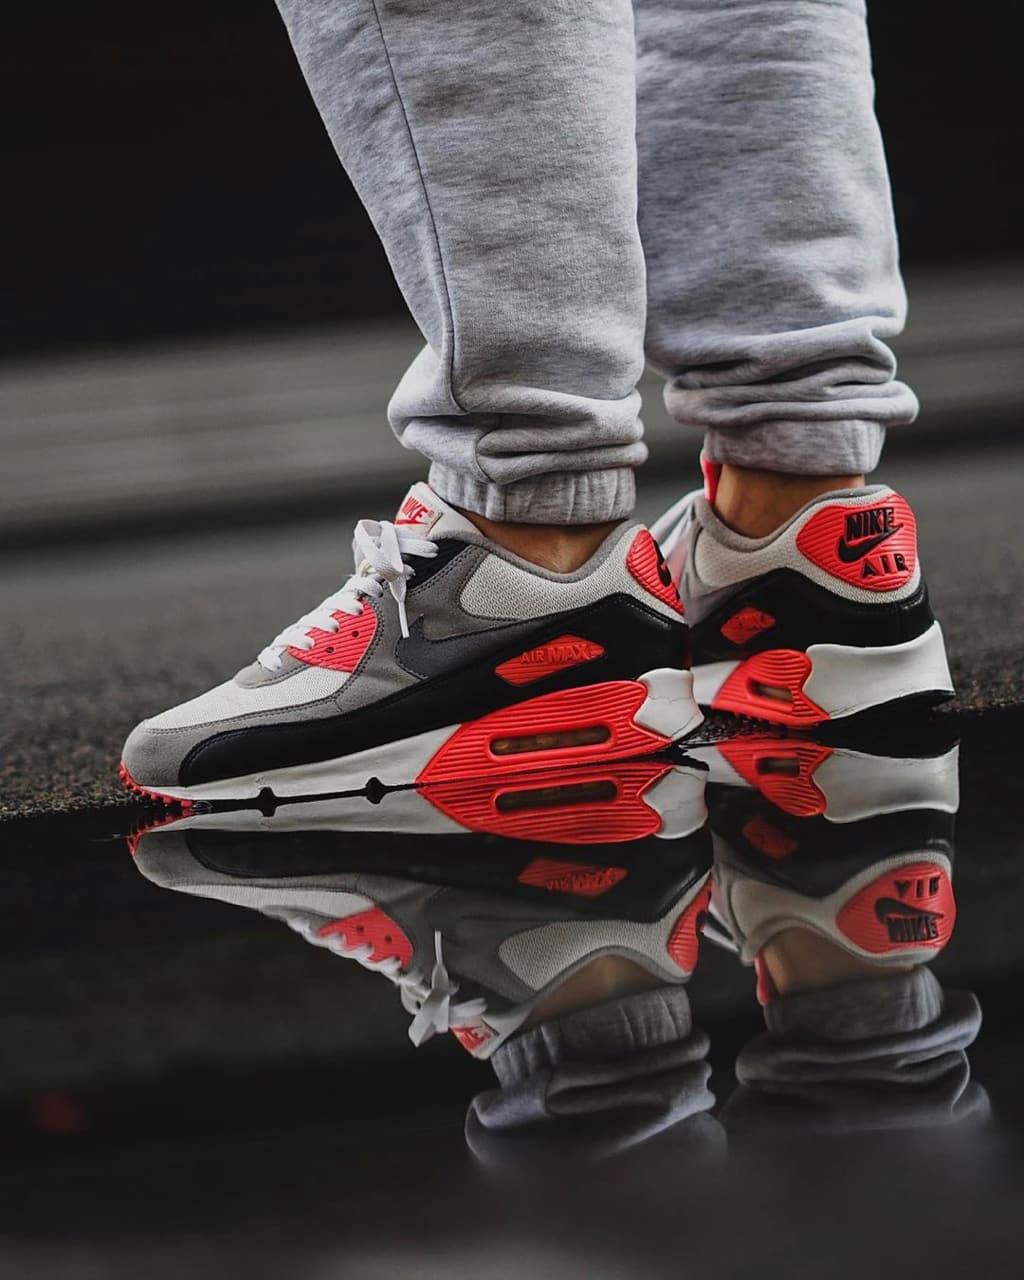 Nike Air Max 90 ''Infrared'' - On-feet